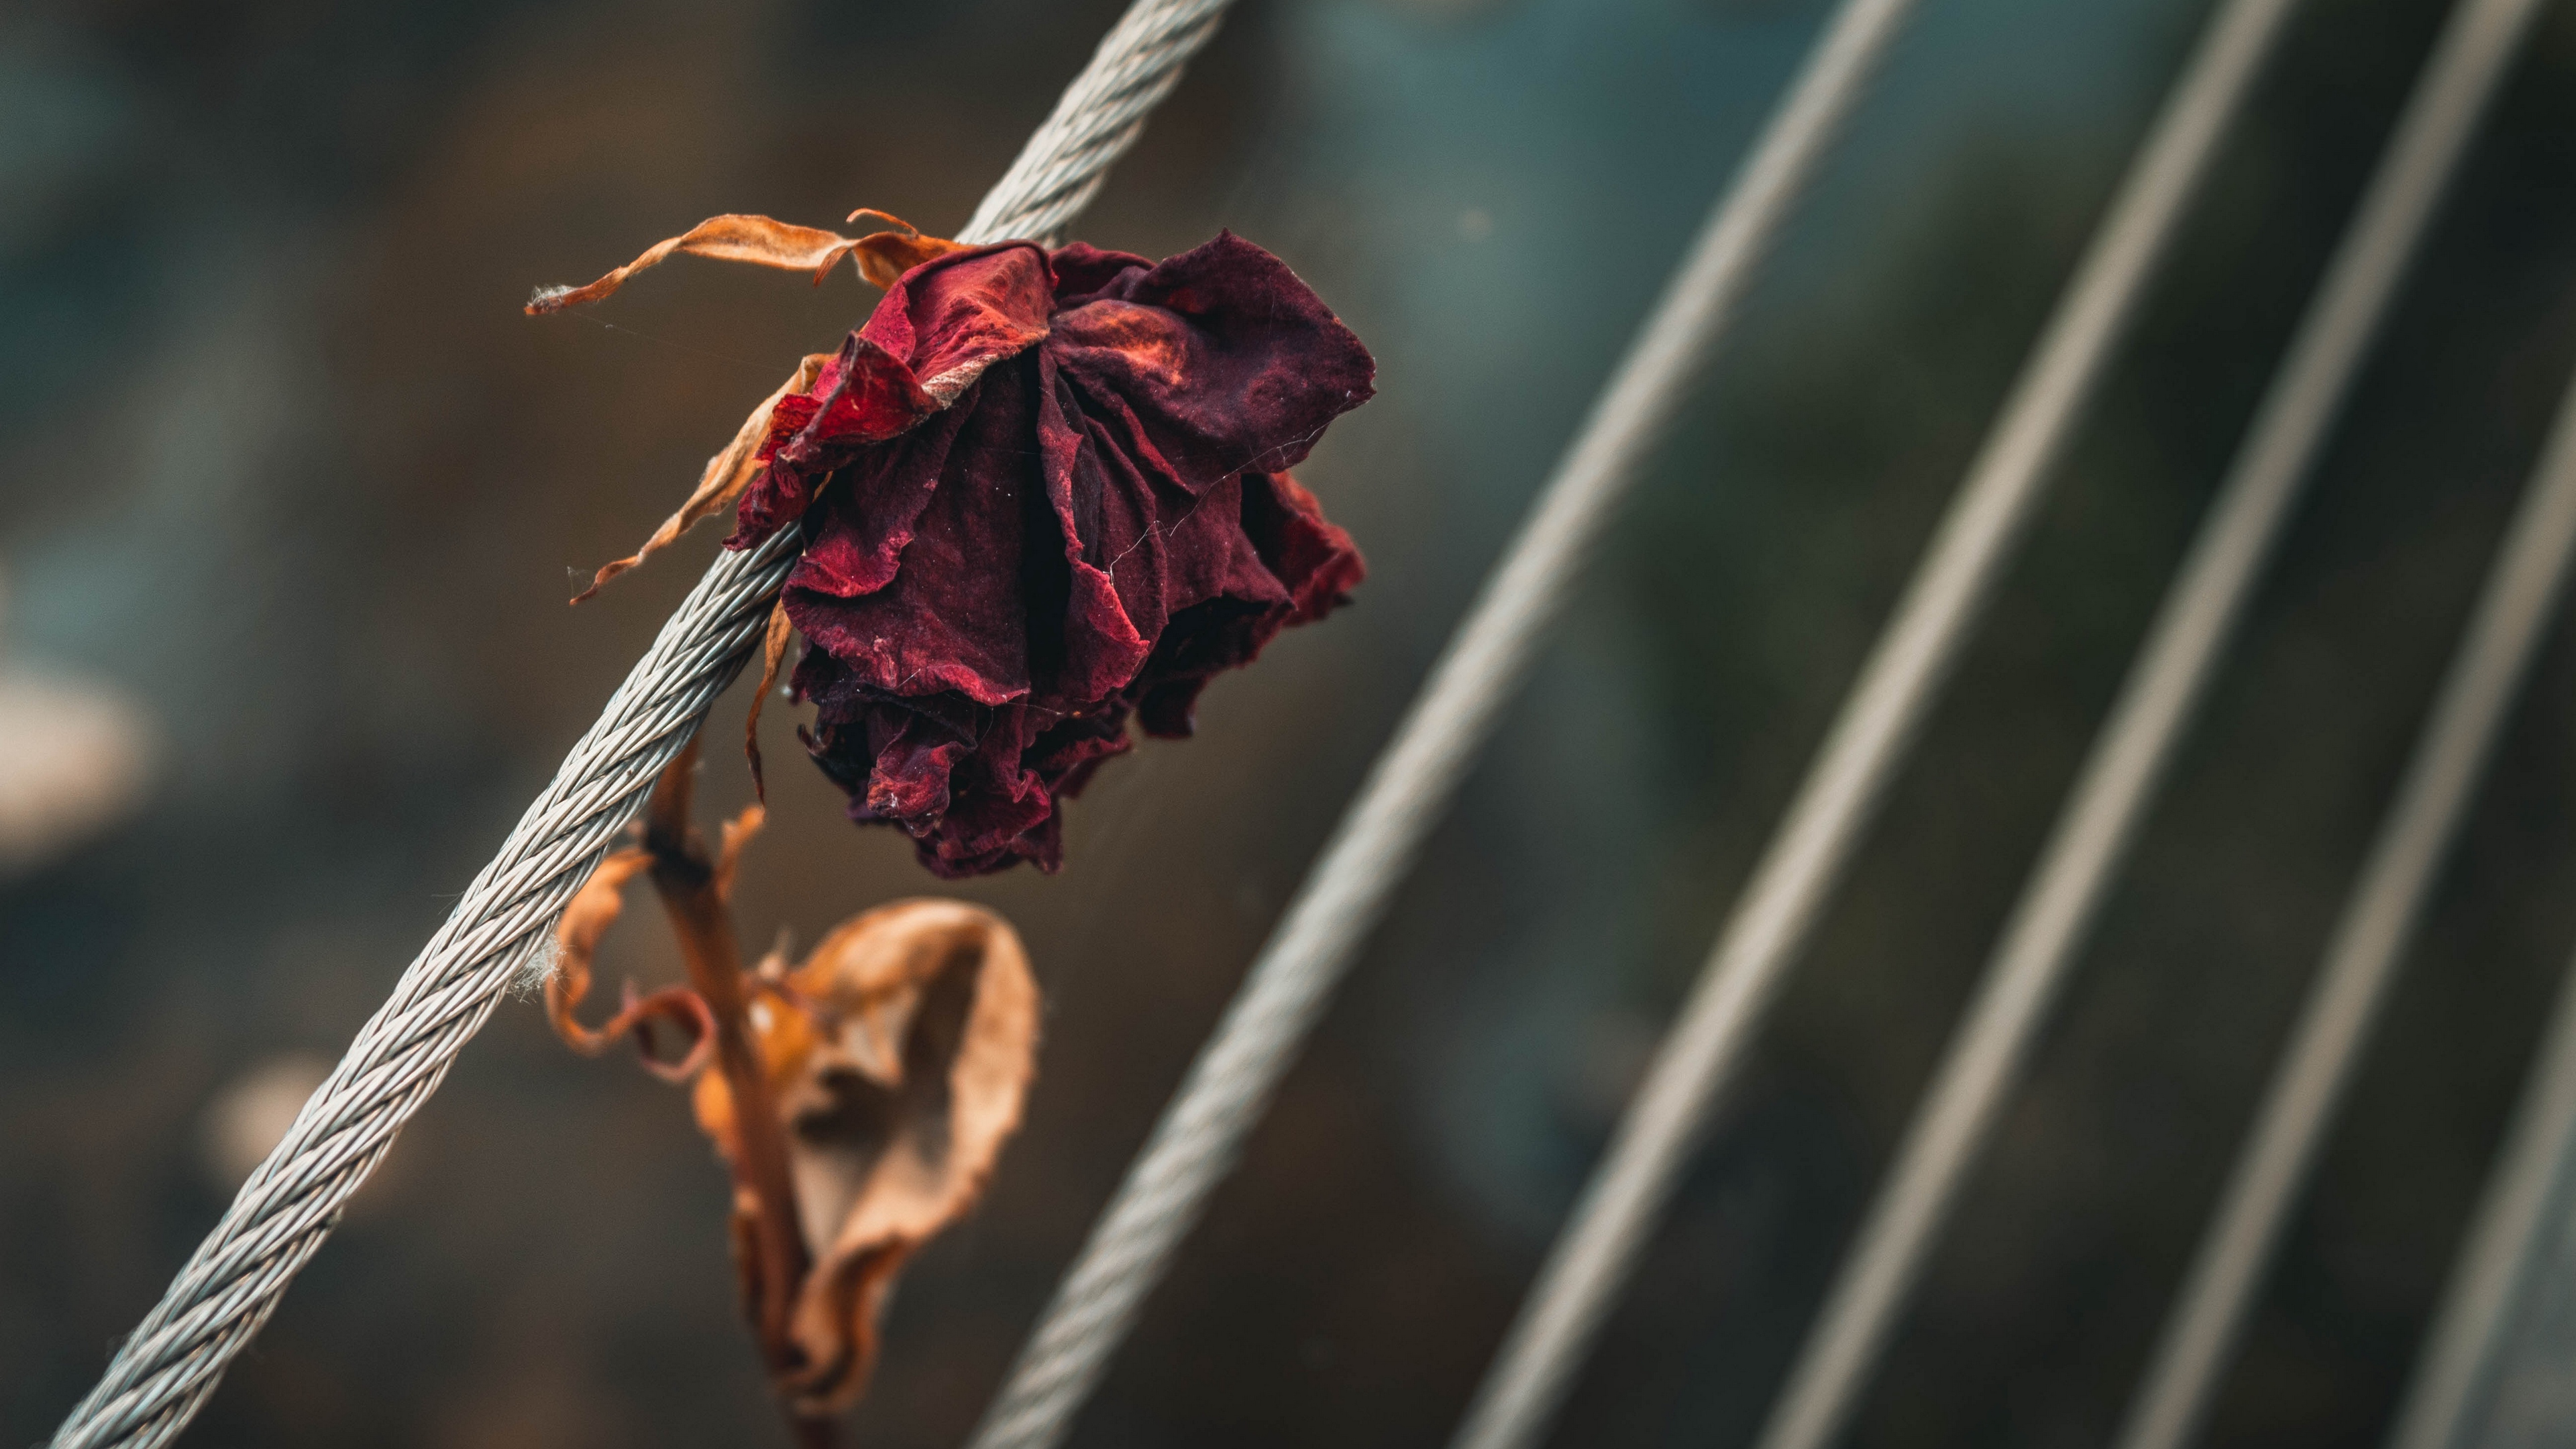 rose dry bud petals 4k 1540064157 - rose, dry, bud, petals 4k - Rose, dry, bud